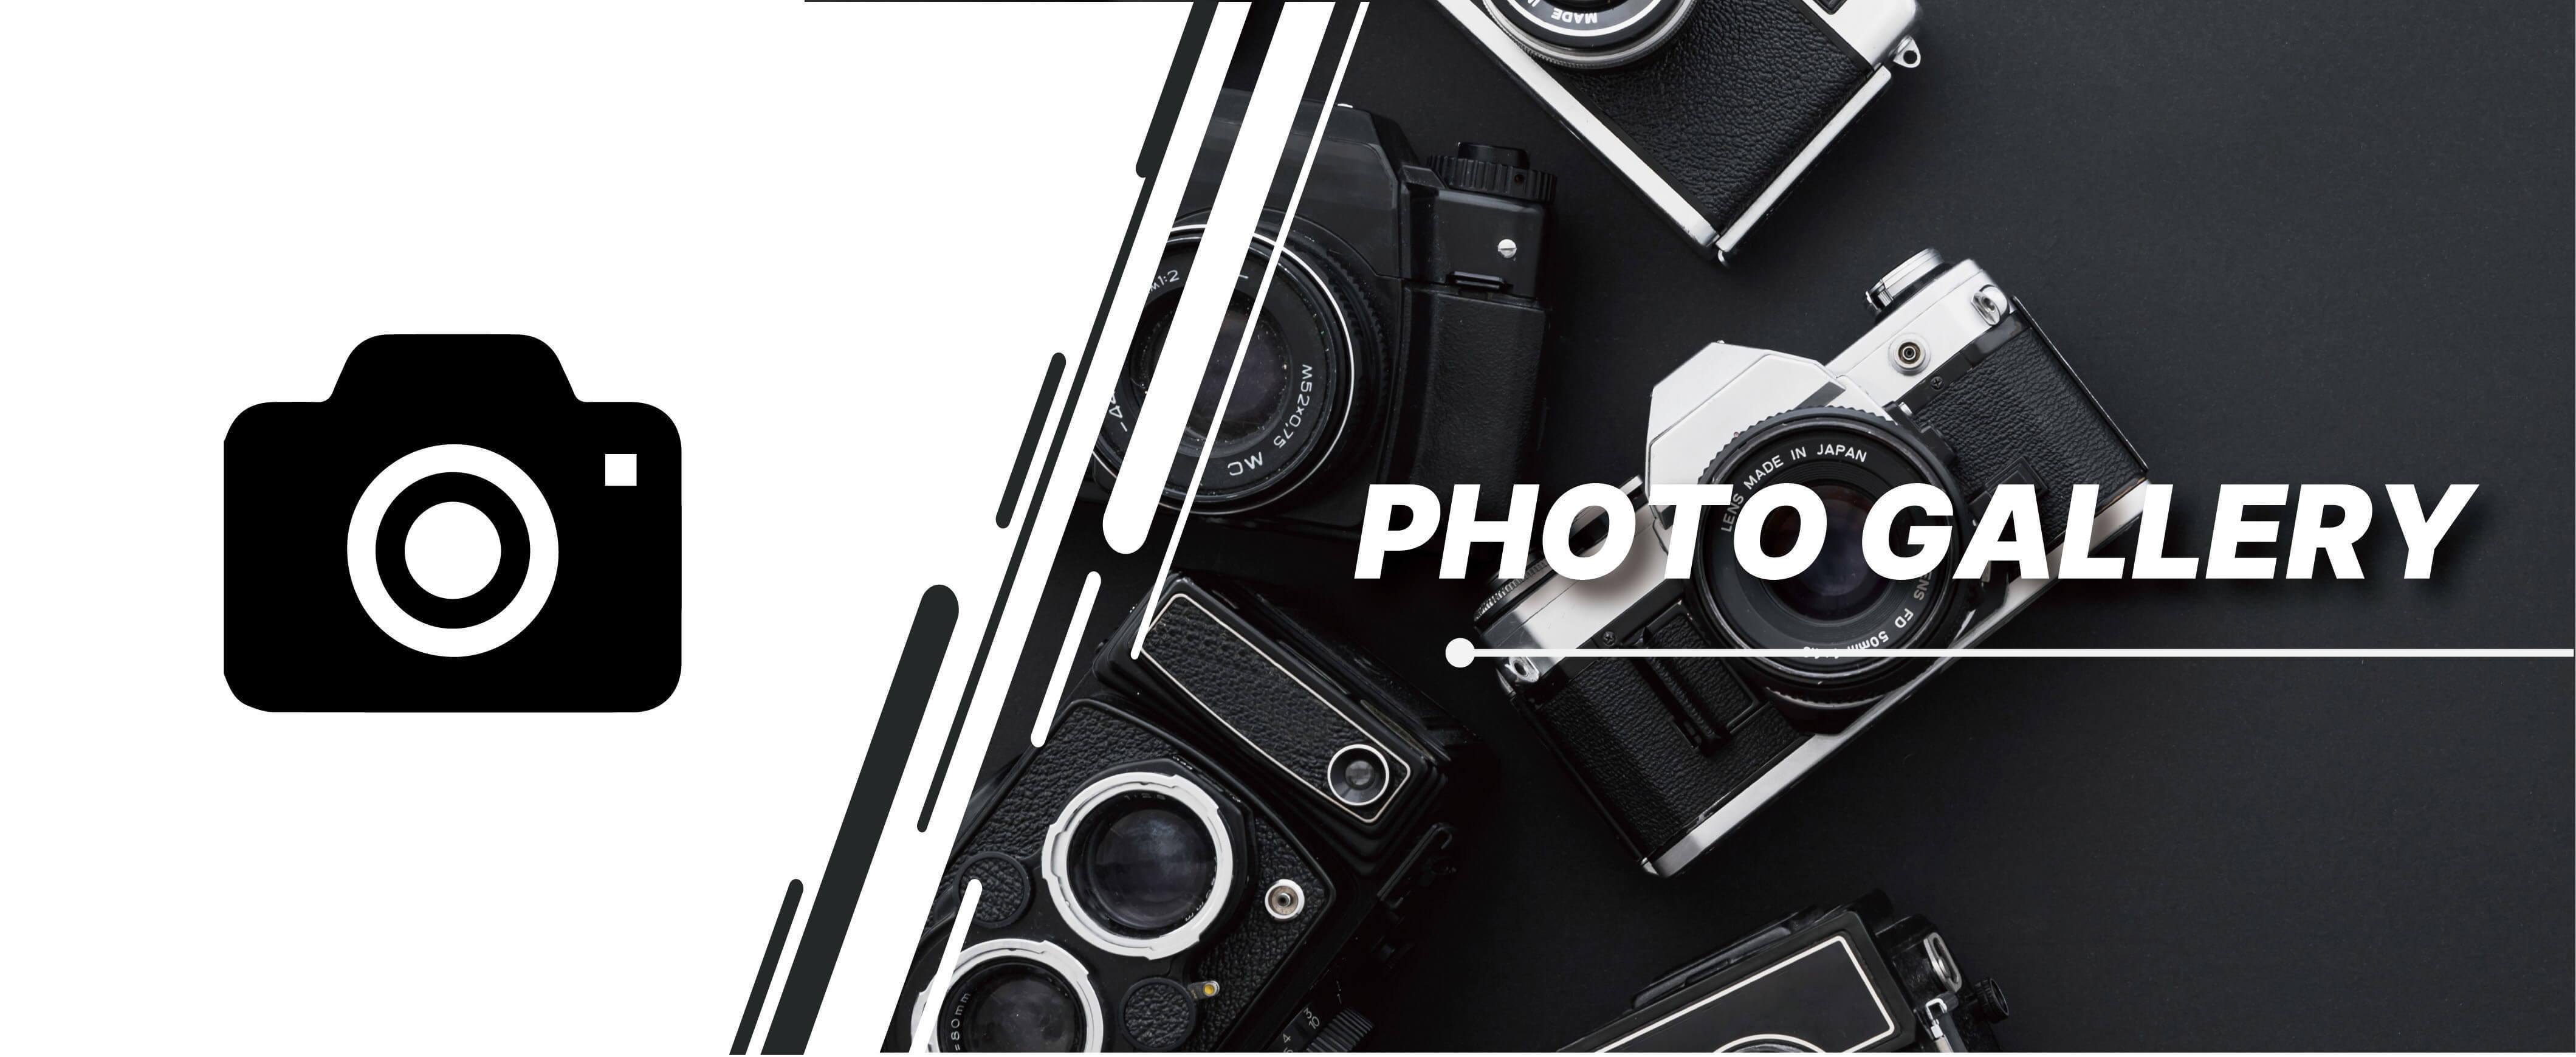 PHOTOGALLERYトップバナー